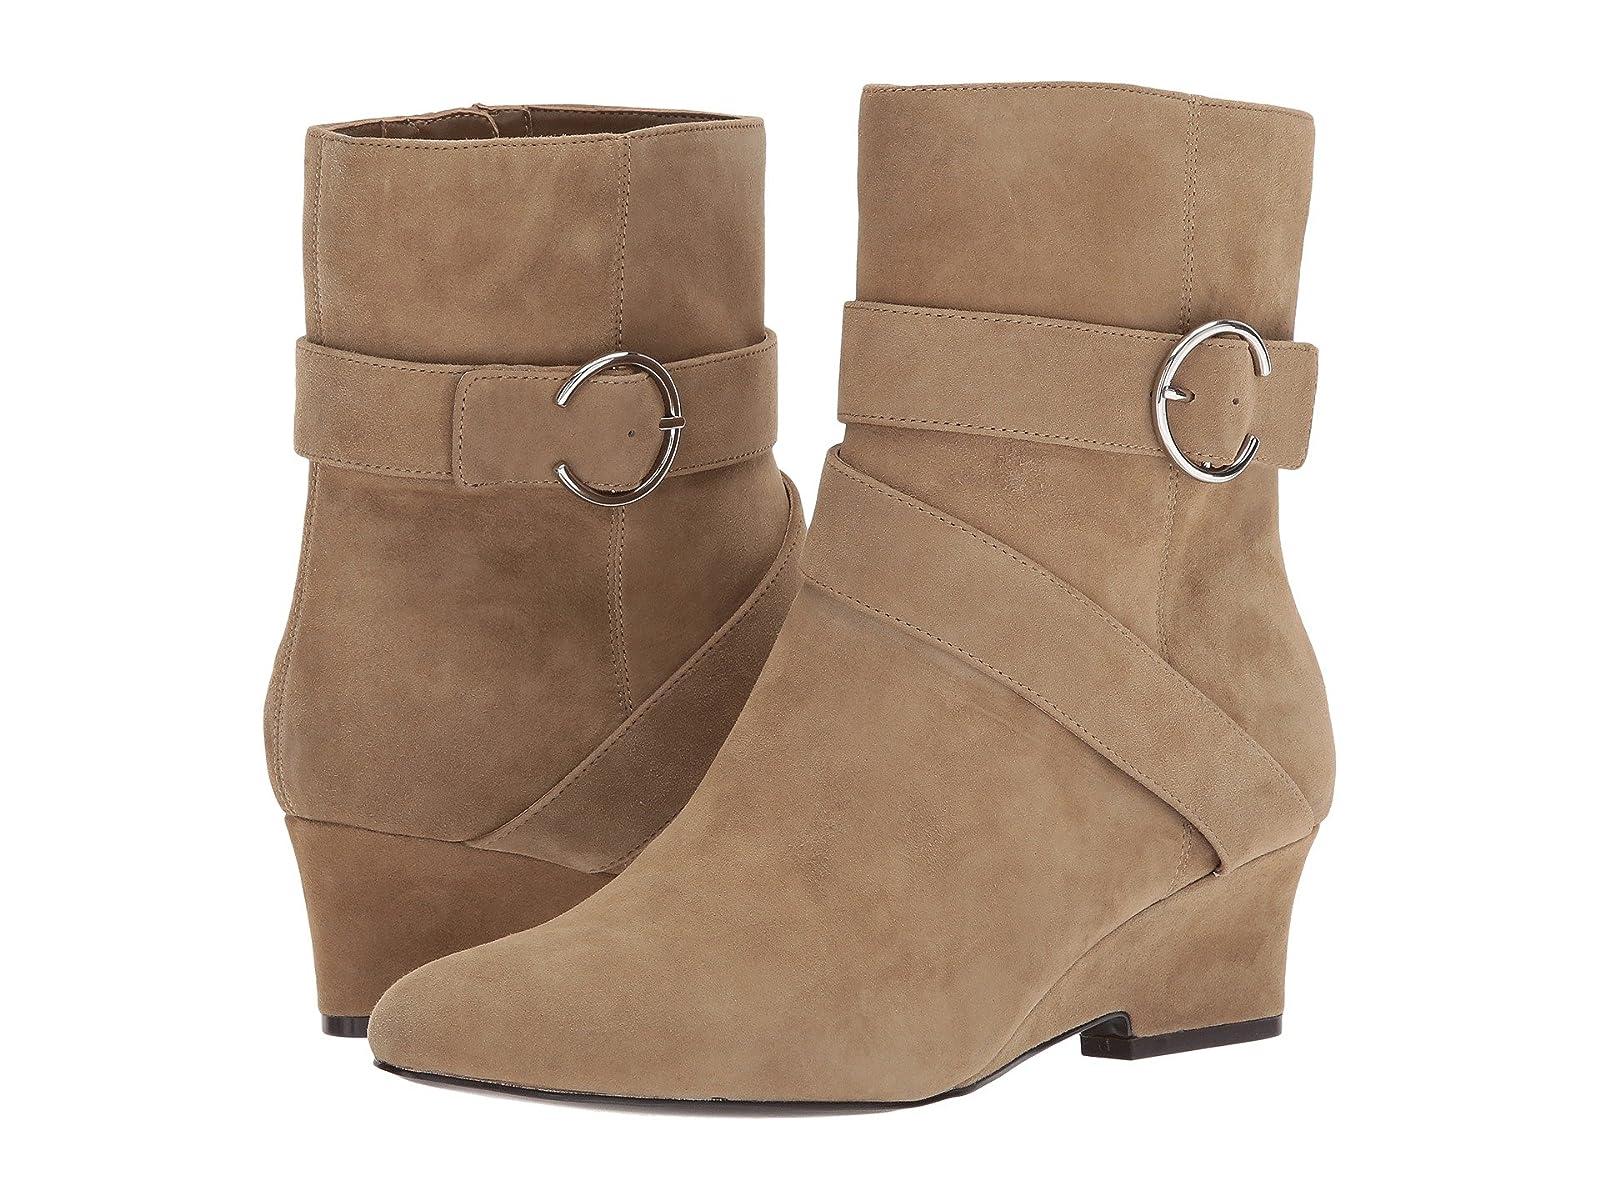 Nine West JaukedCheap and distinctive eye-catching shoes